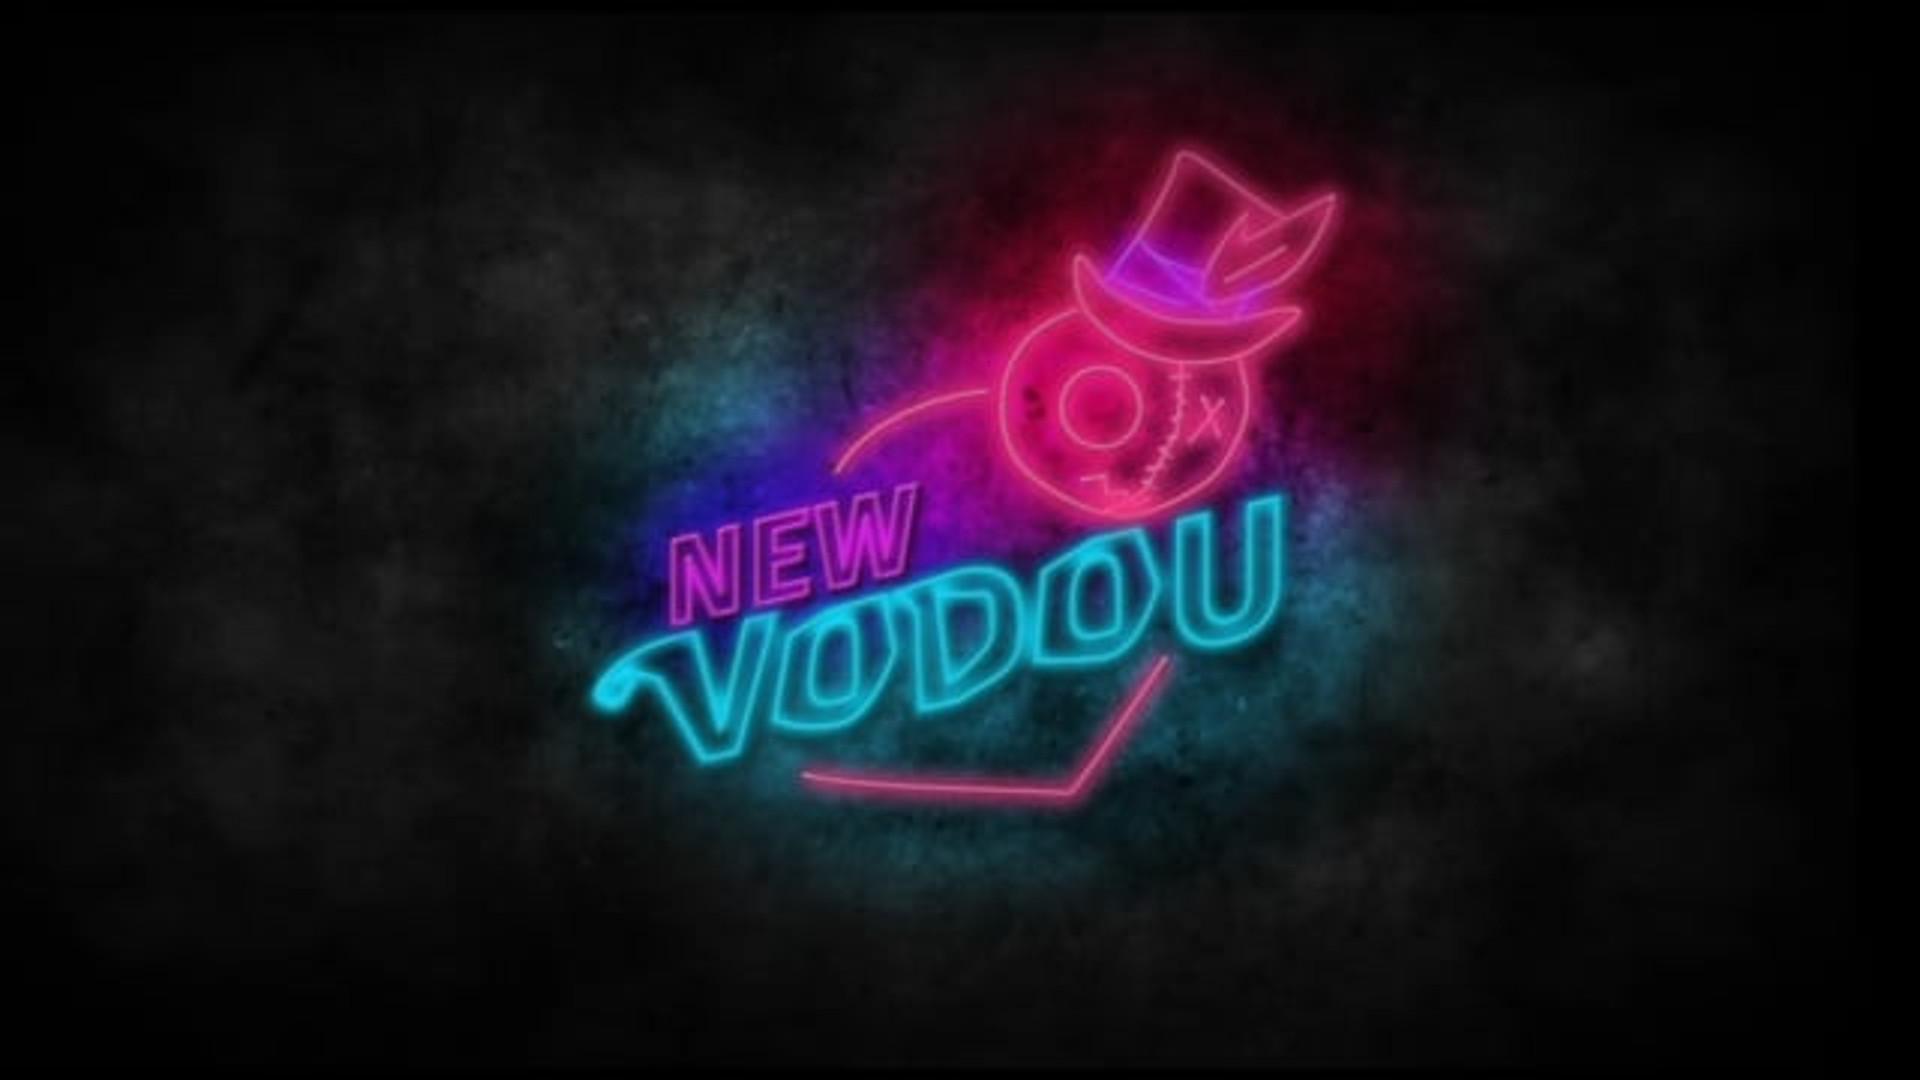 New Vodue